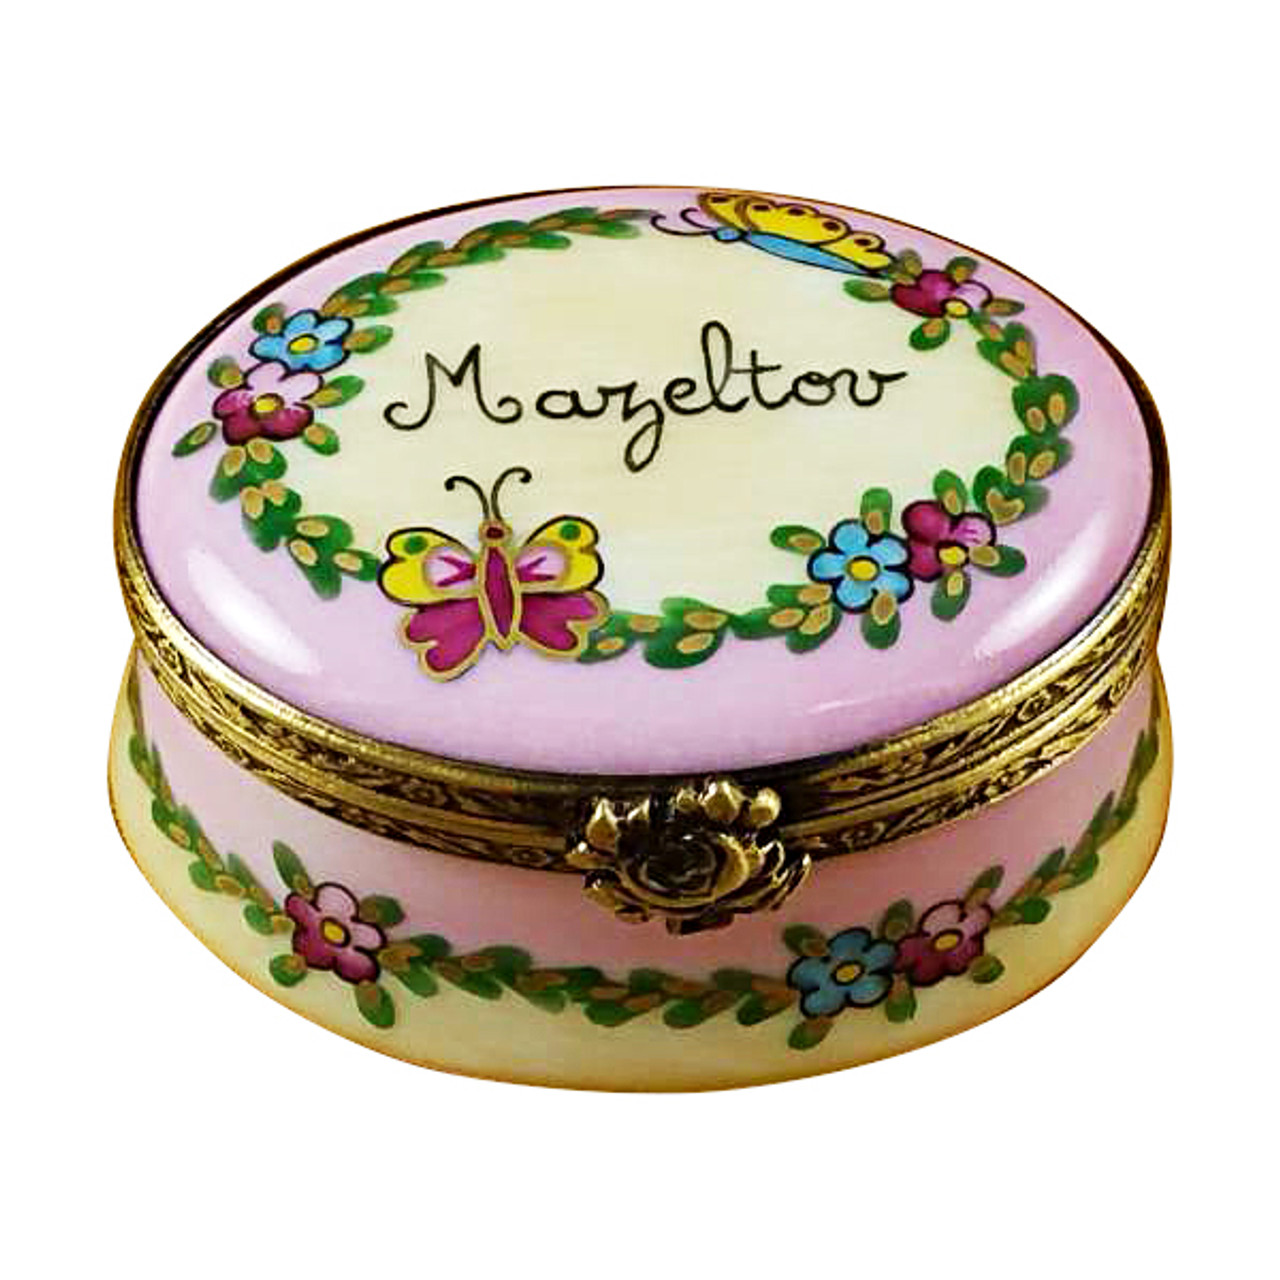 Oval Box - Mazeltov Rochard Limoges Box